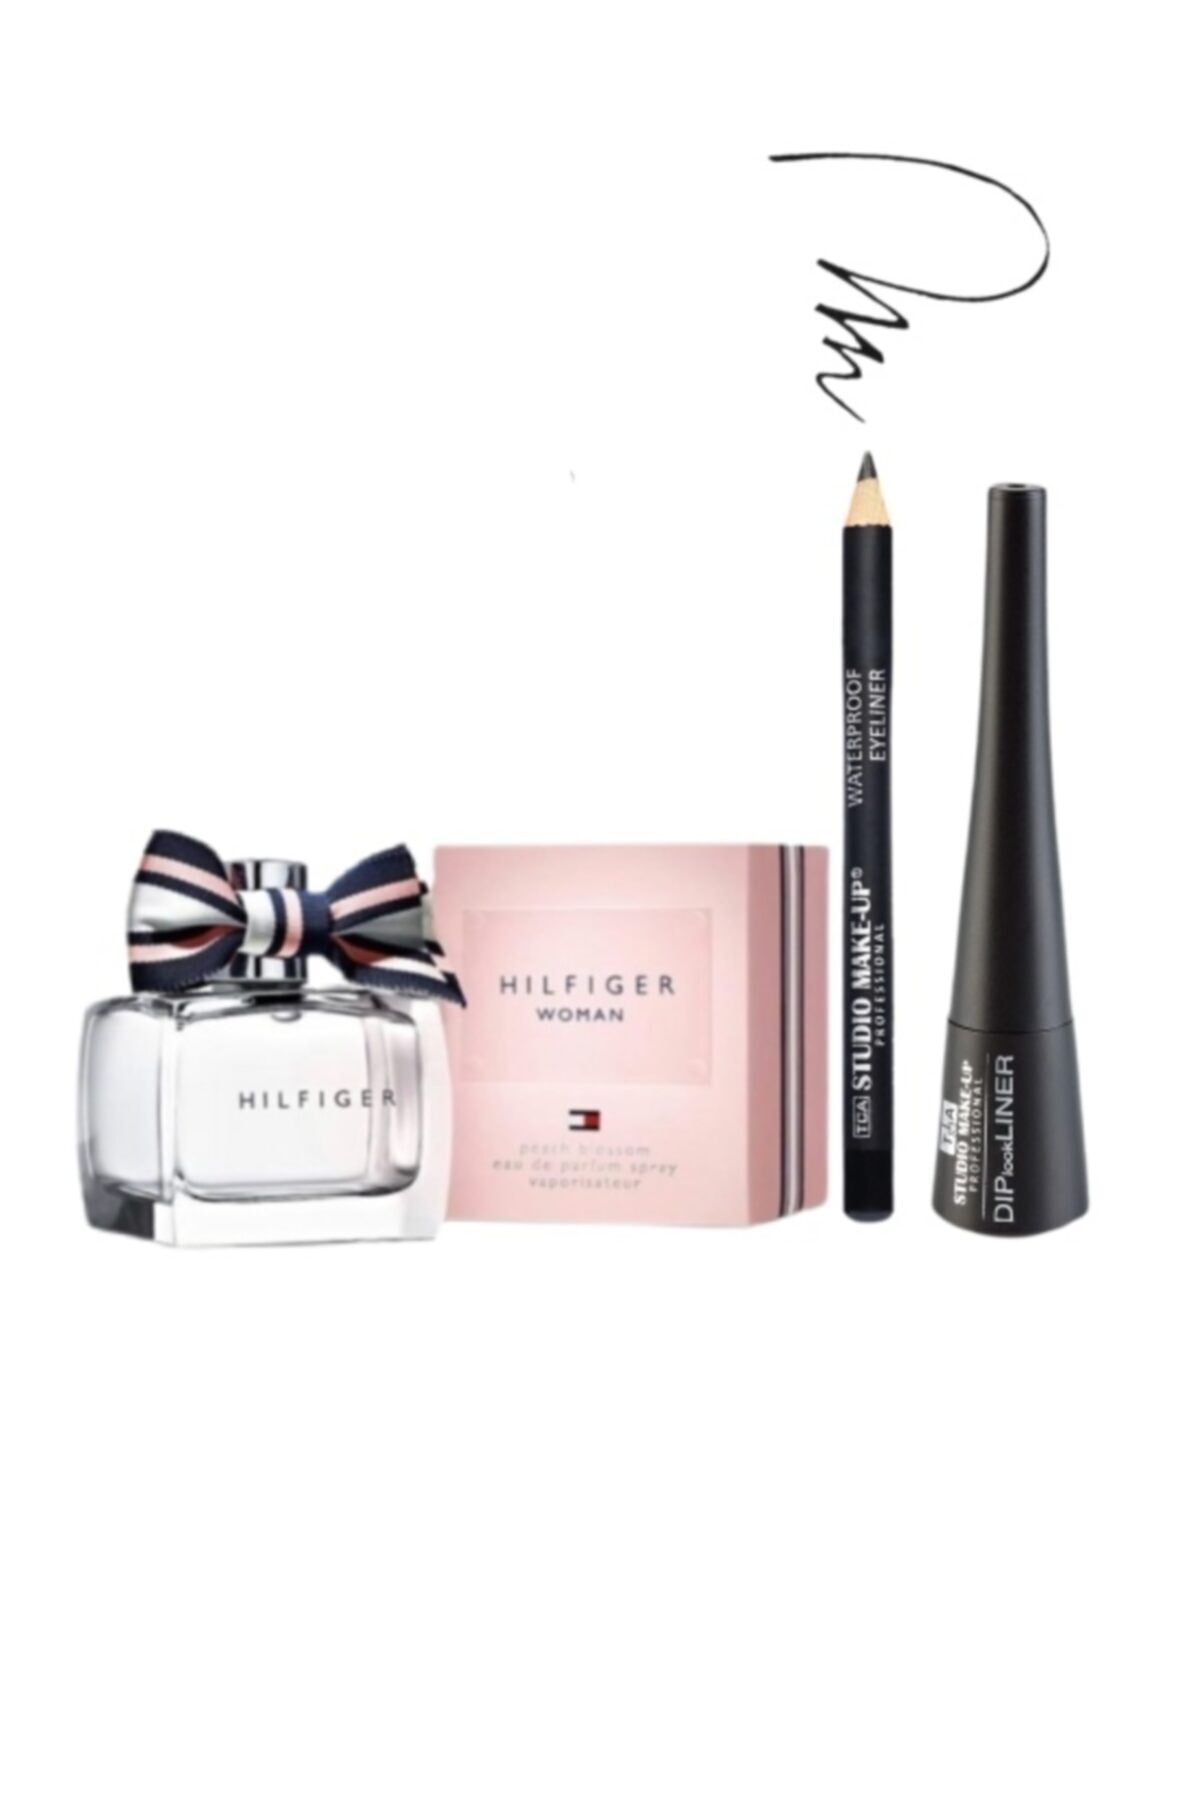 Tommy Hilfiger Peach Blossom 30 Ml Edp Kadın Parfümü + 2'li Makyaj Seti 1